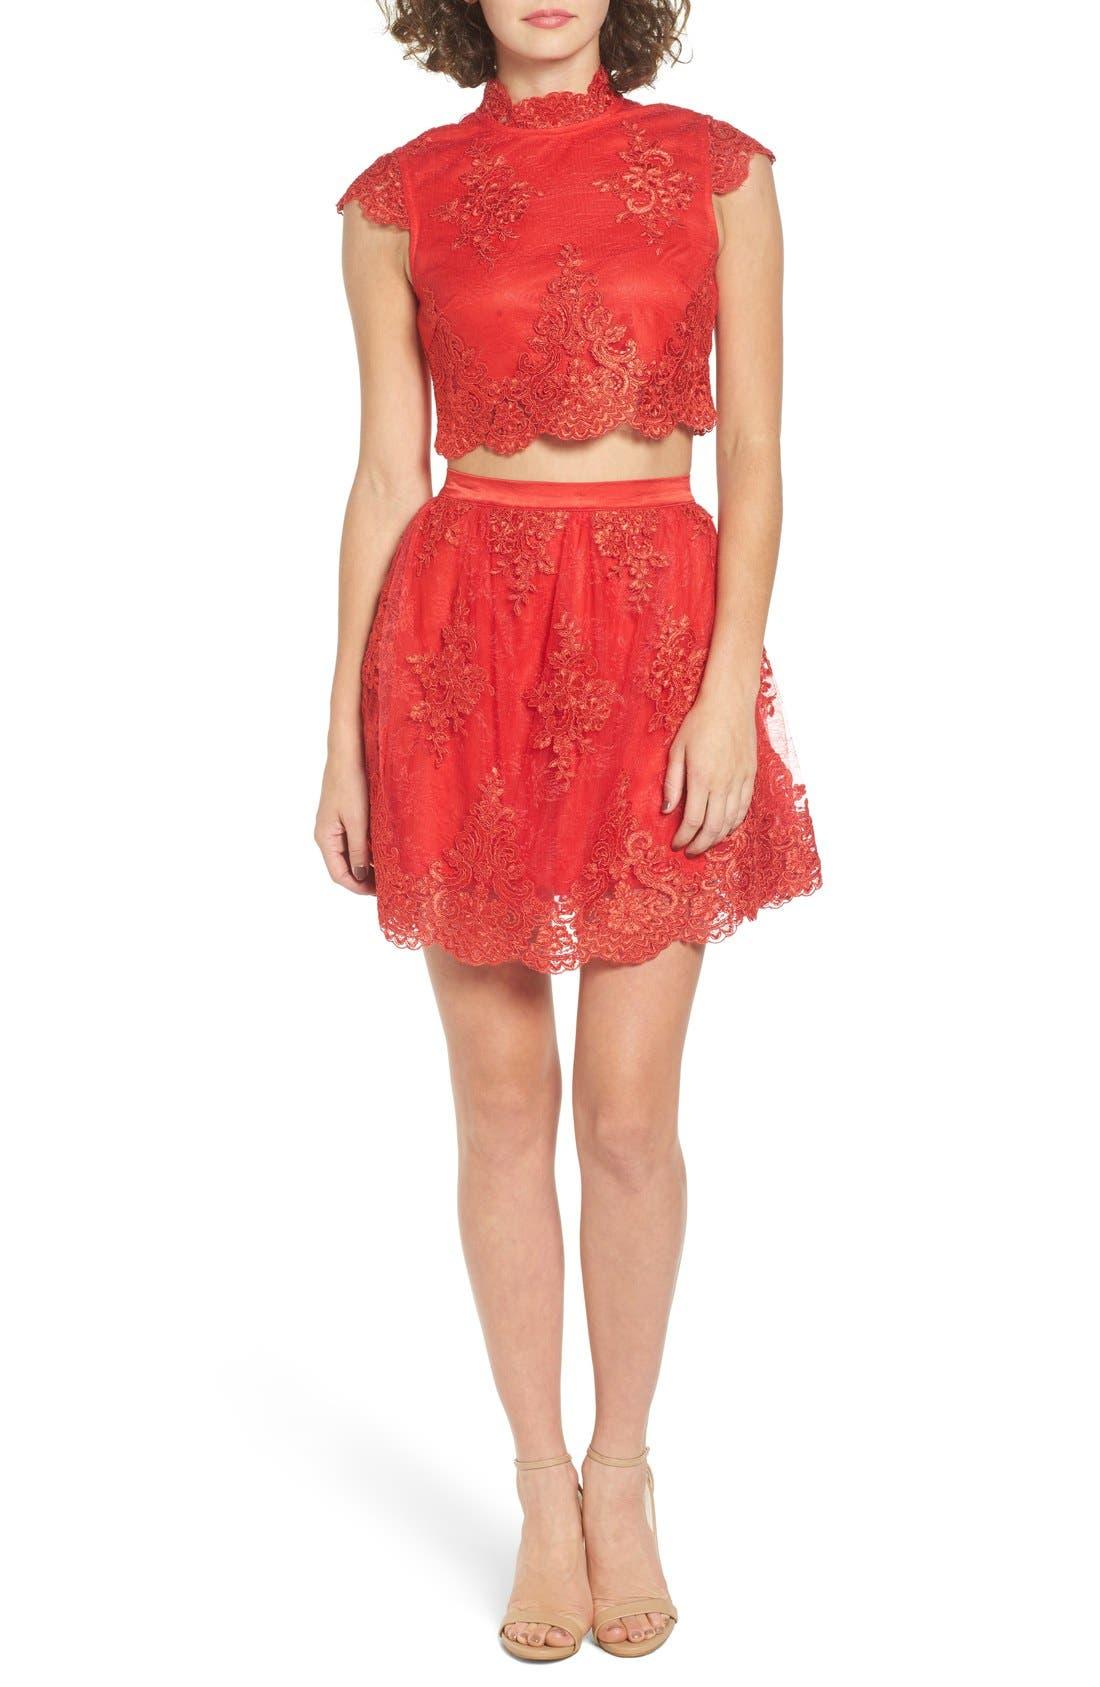 Main Image - a. drea Lace Cap Sleeve Two-Piece Skater Dress